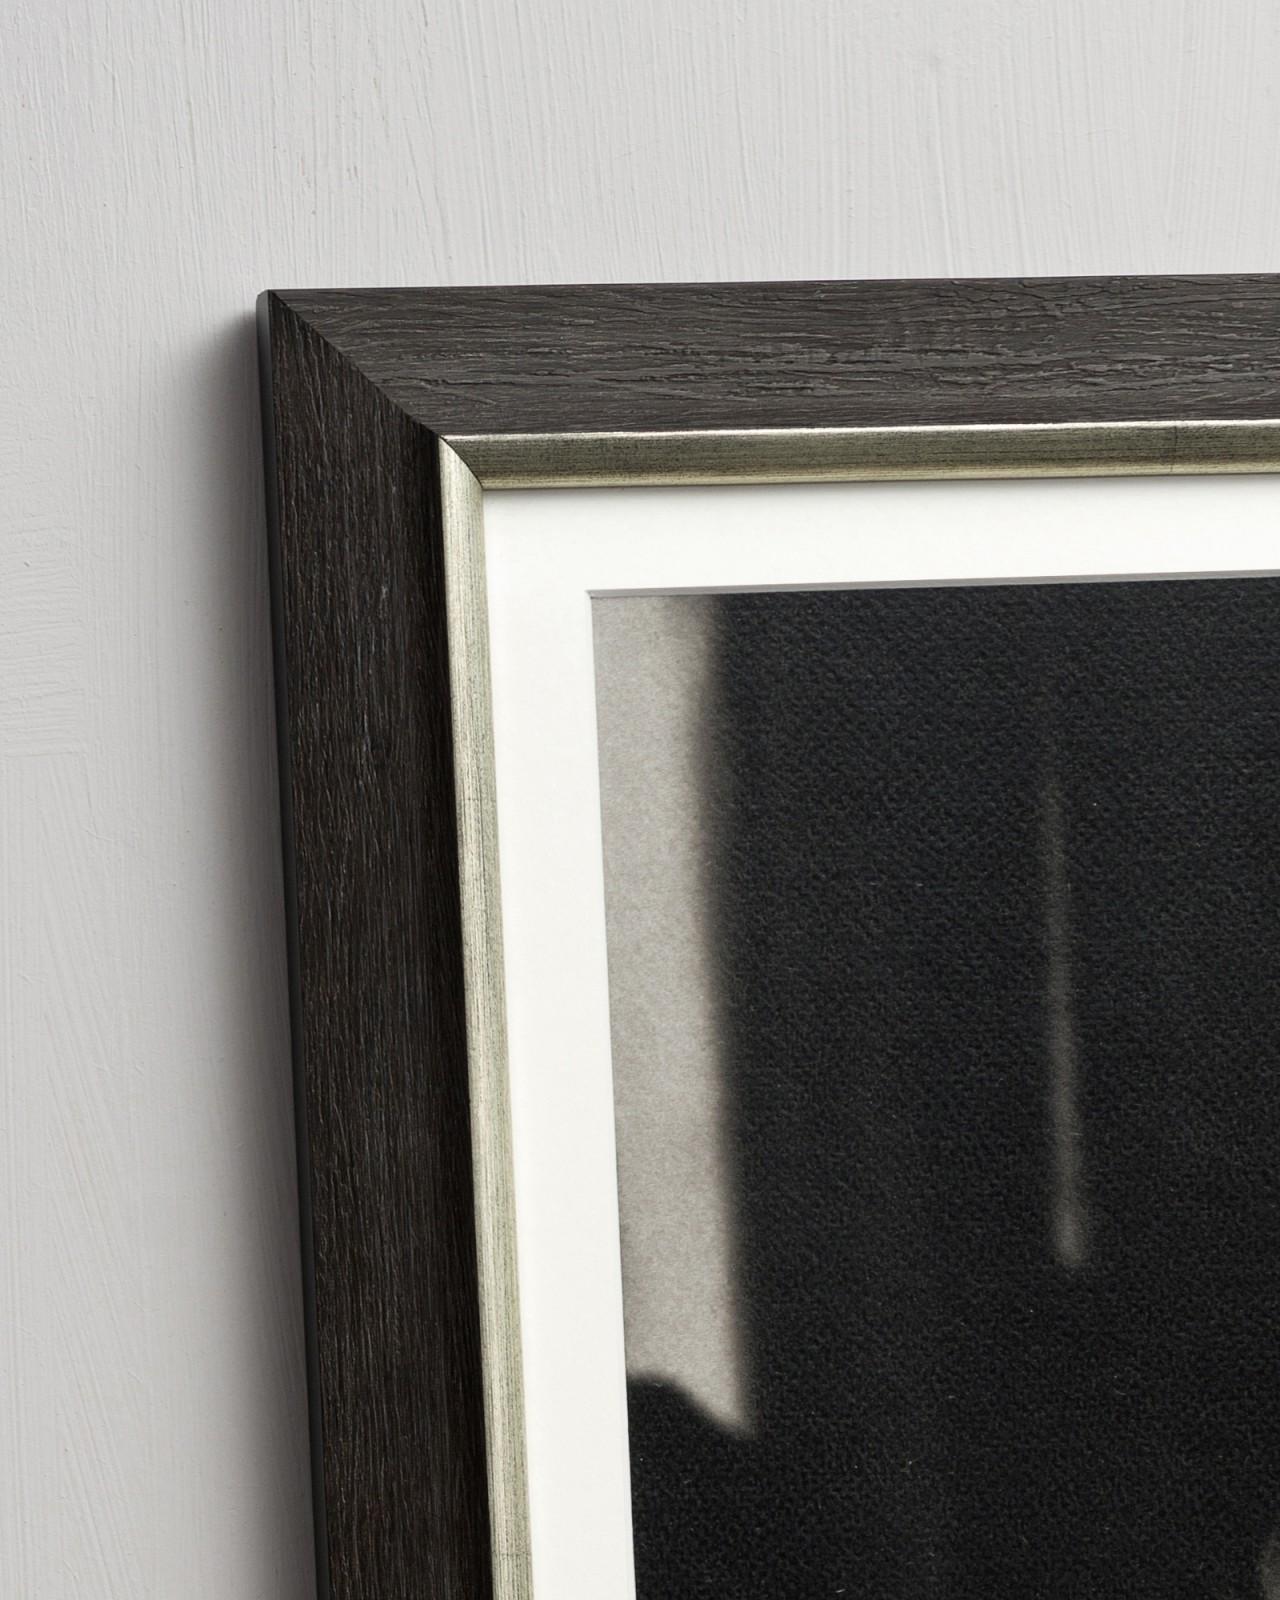 AMERICAN CASINO Set of 2 Framed art